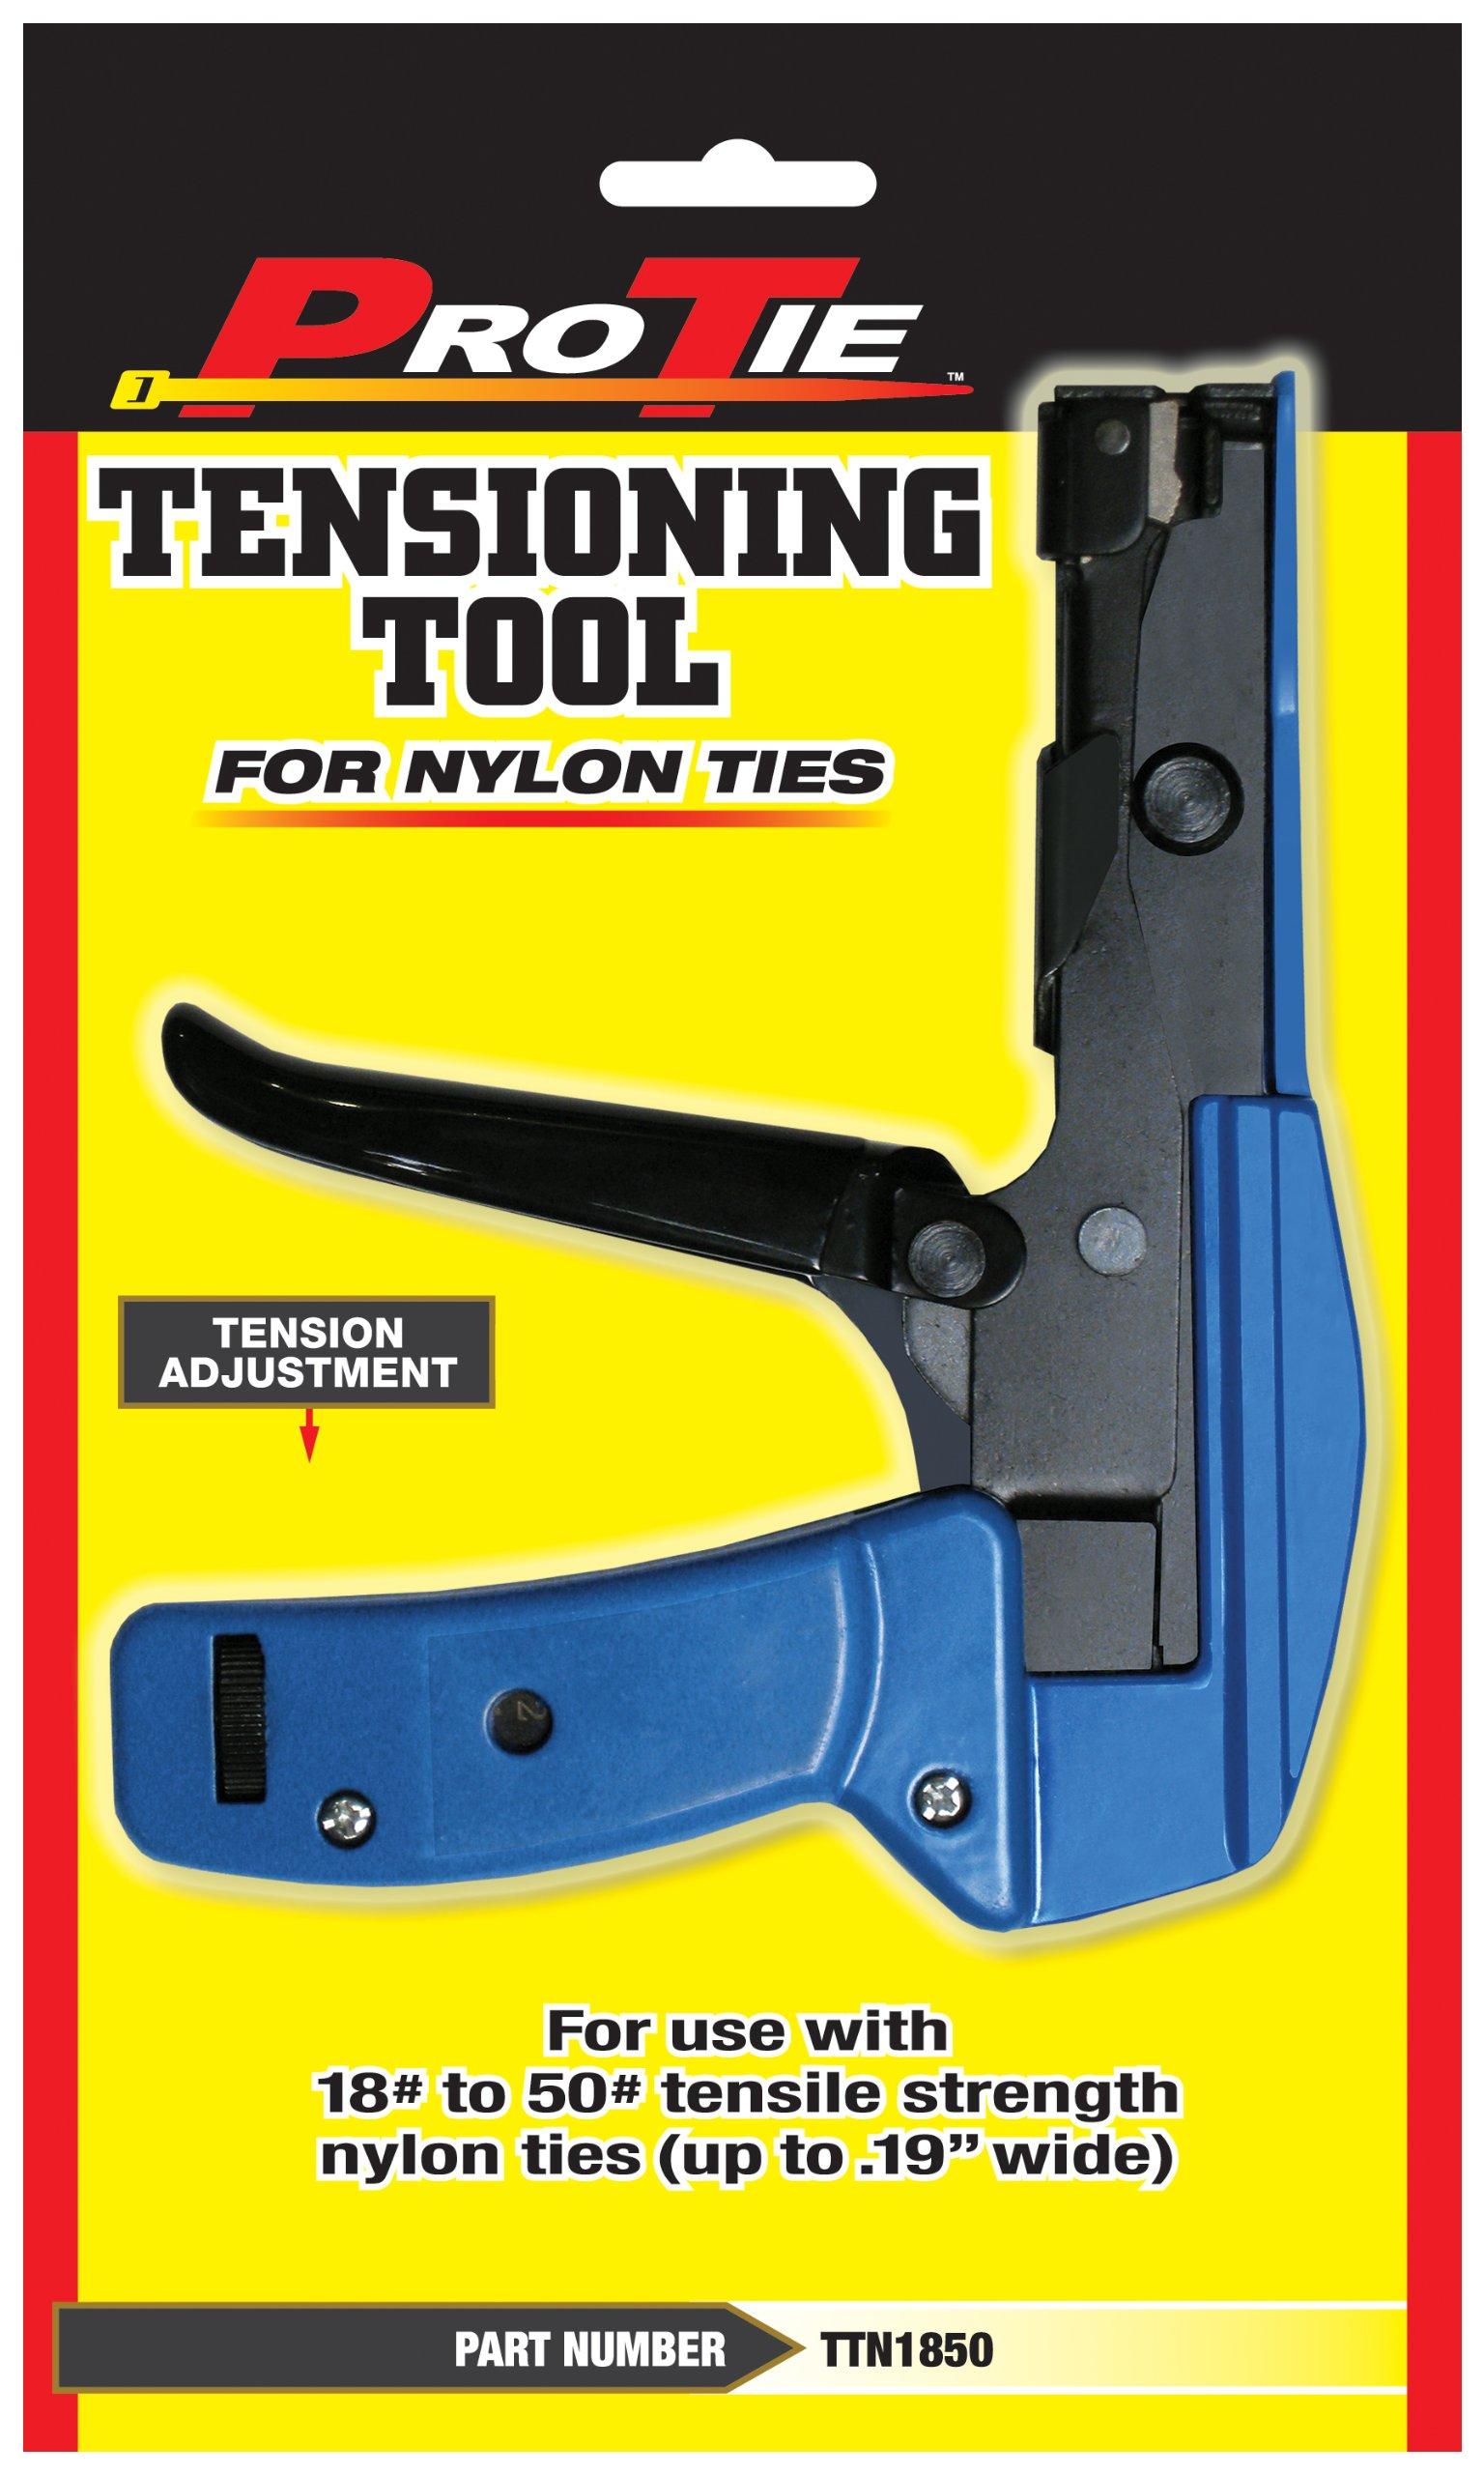 Pro Tie TTN1850 6.25-Inch 18 to 50-Pound Light Duty Tension Tool Ties, Nylon